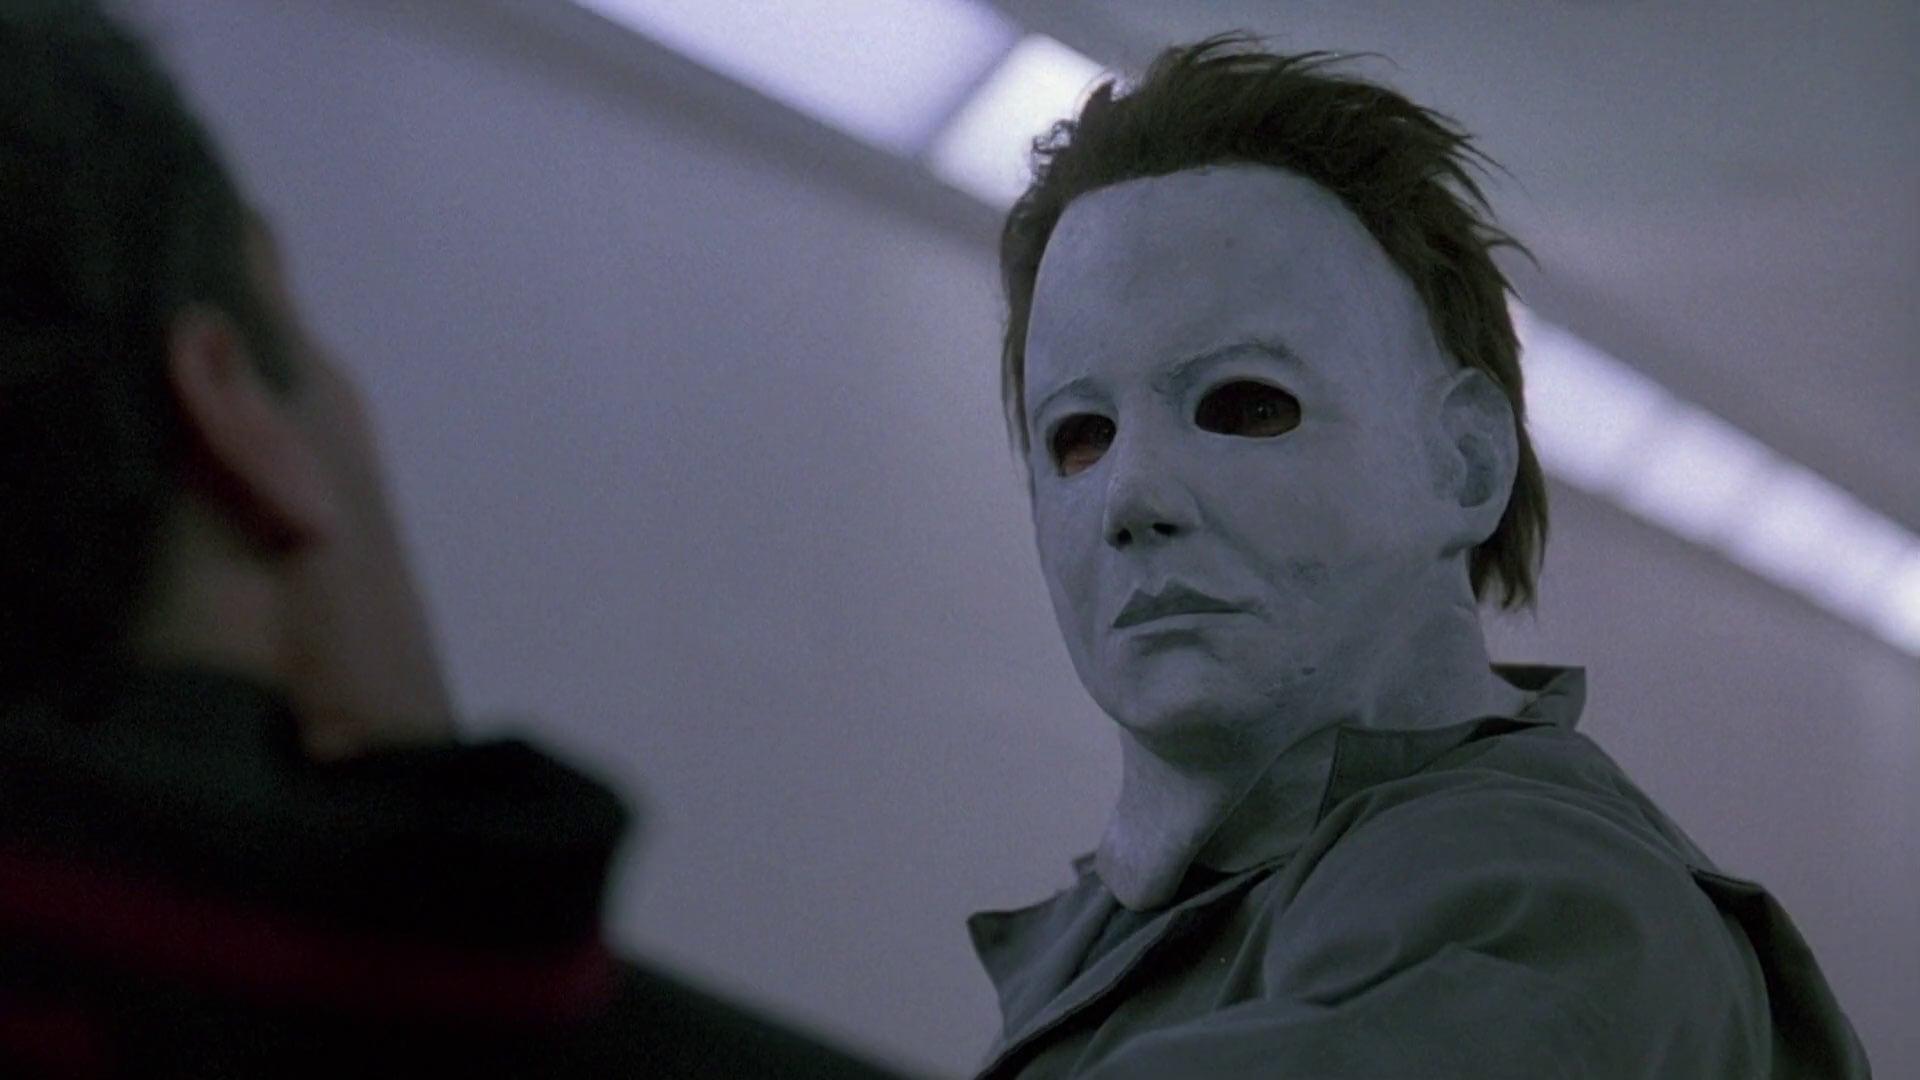 Regarder Halloween 6 : La Malédiction de Michael Myers en streaming gratuit